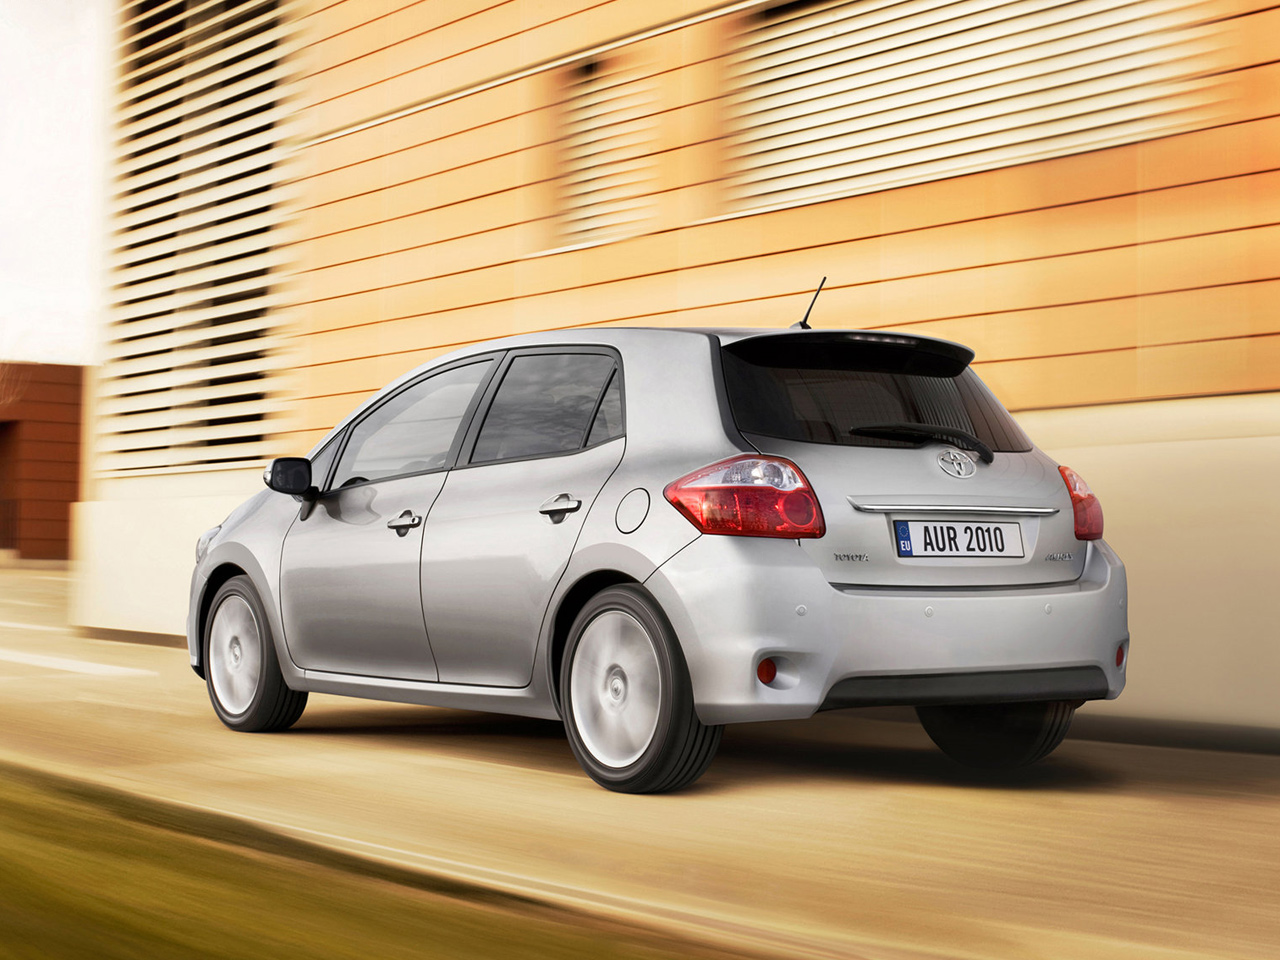 Toyota Auris 2015 - Тойота Аурис Описание и цены | Тойота ...